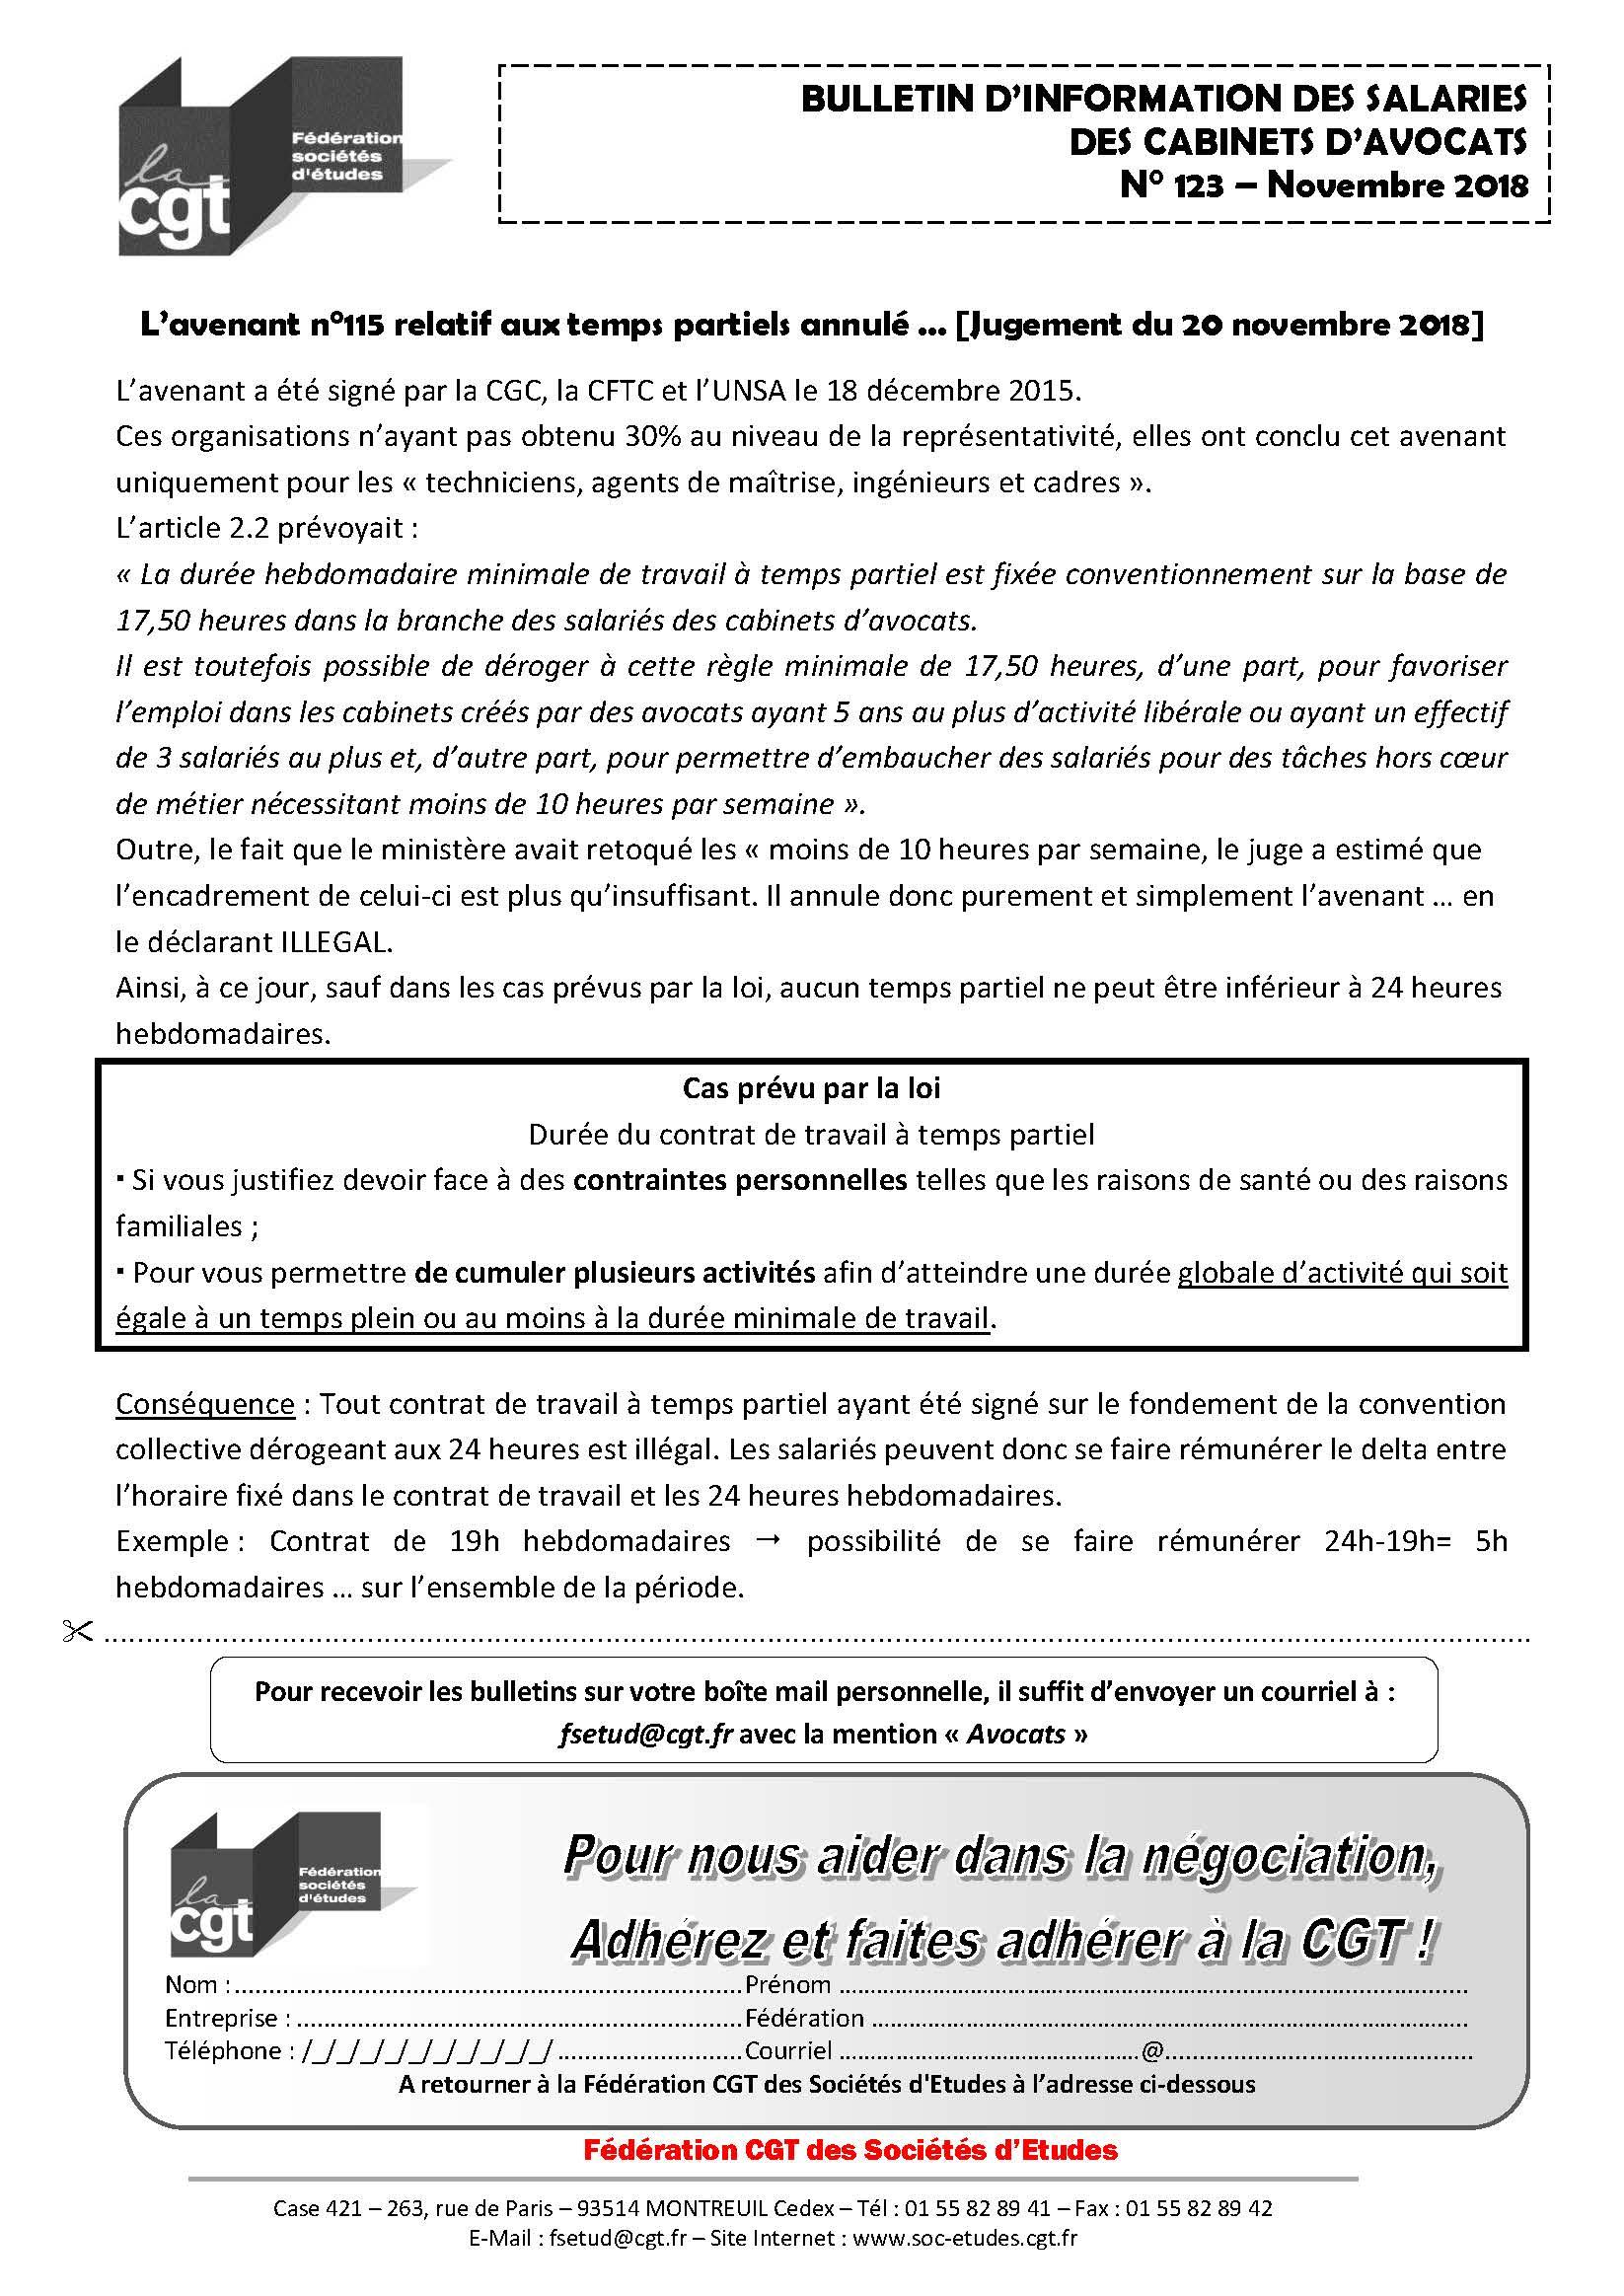 Bulletin D Information Des Salaries Des Cabinets D Avocat N 123